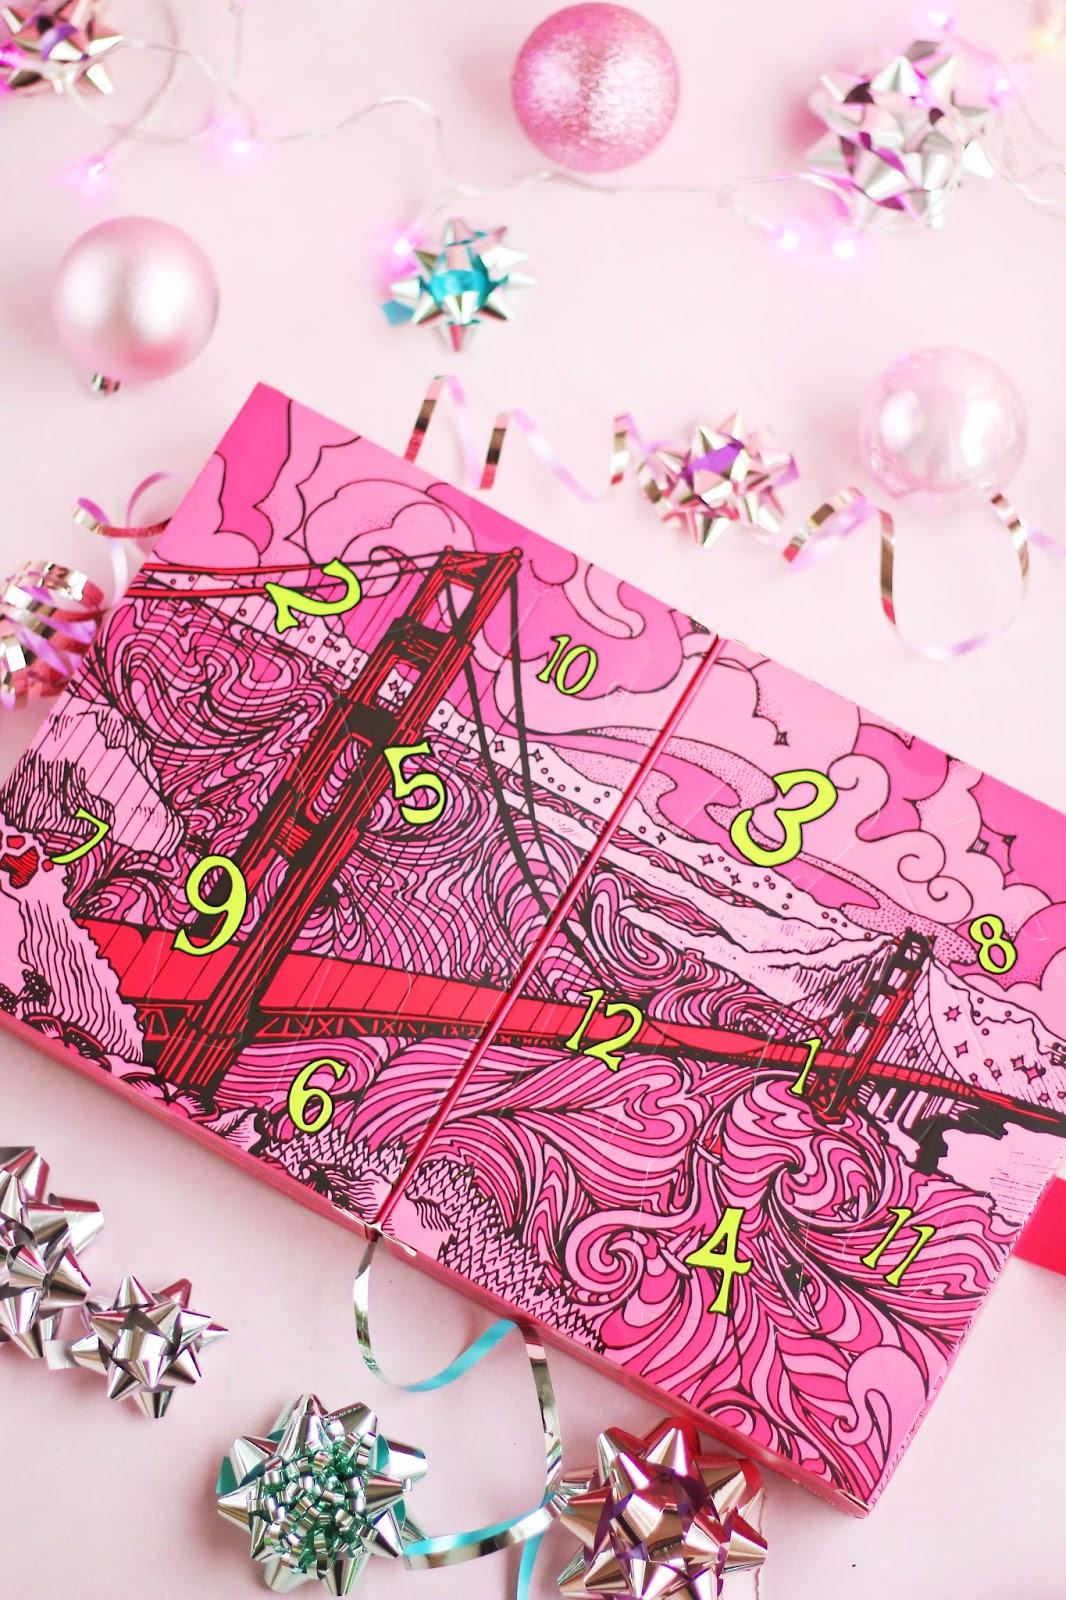 Review, Christmas shopping, Benefit gift sets,  Benefit BAYbalicious Makeup Gift Set, San Francisco Winter Wonderglam Advent Calendar-